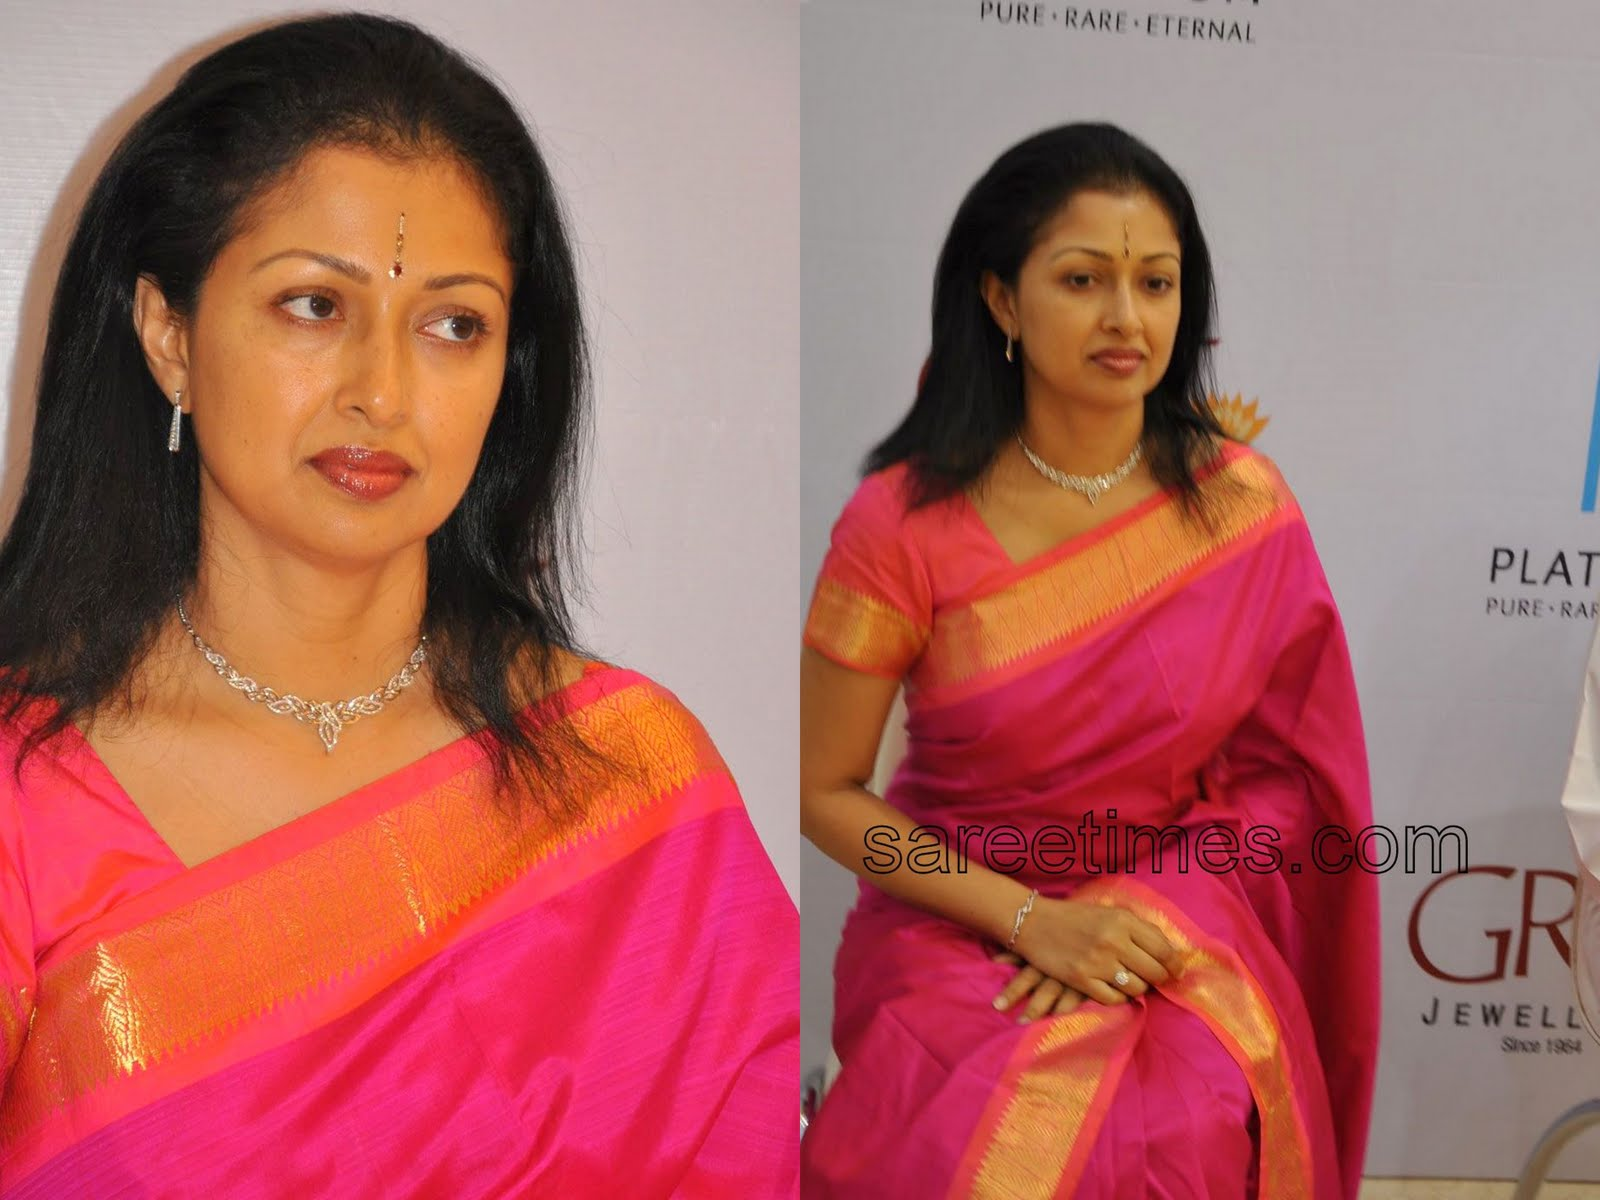 http://2.bp.blogspot.com/_58_qEOwiSDY/TB6L-tPfqTI/AAAAAAAADLo/DsRRABr0mts/s1600/Gauthami-Pink-Silk-Saree.jpg